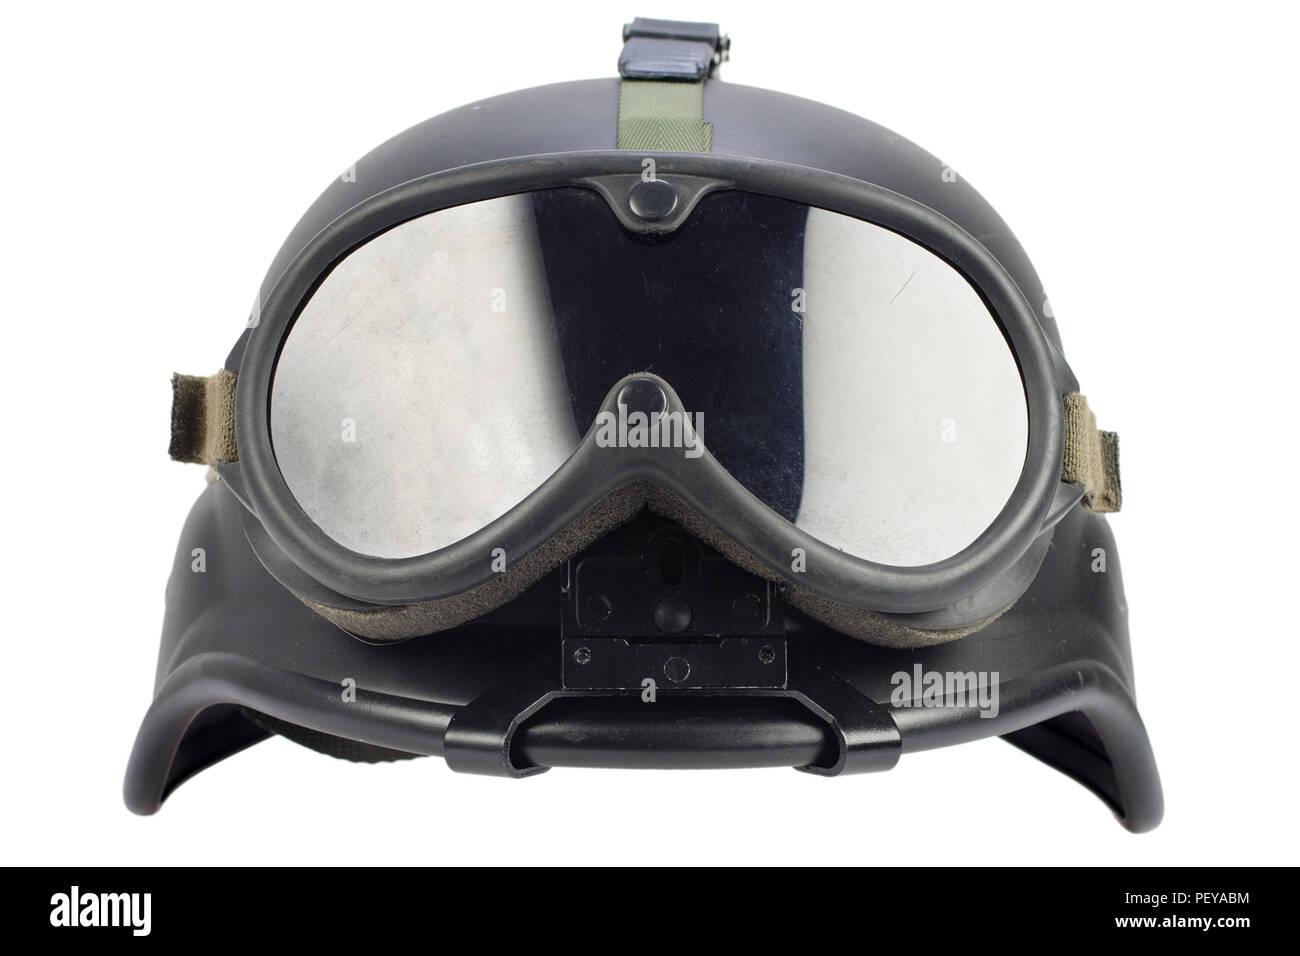 El ejército negro casco Kevlar con gafas aislado sobre fondo blanco ... 617d9e605a9